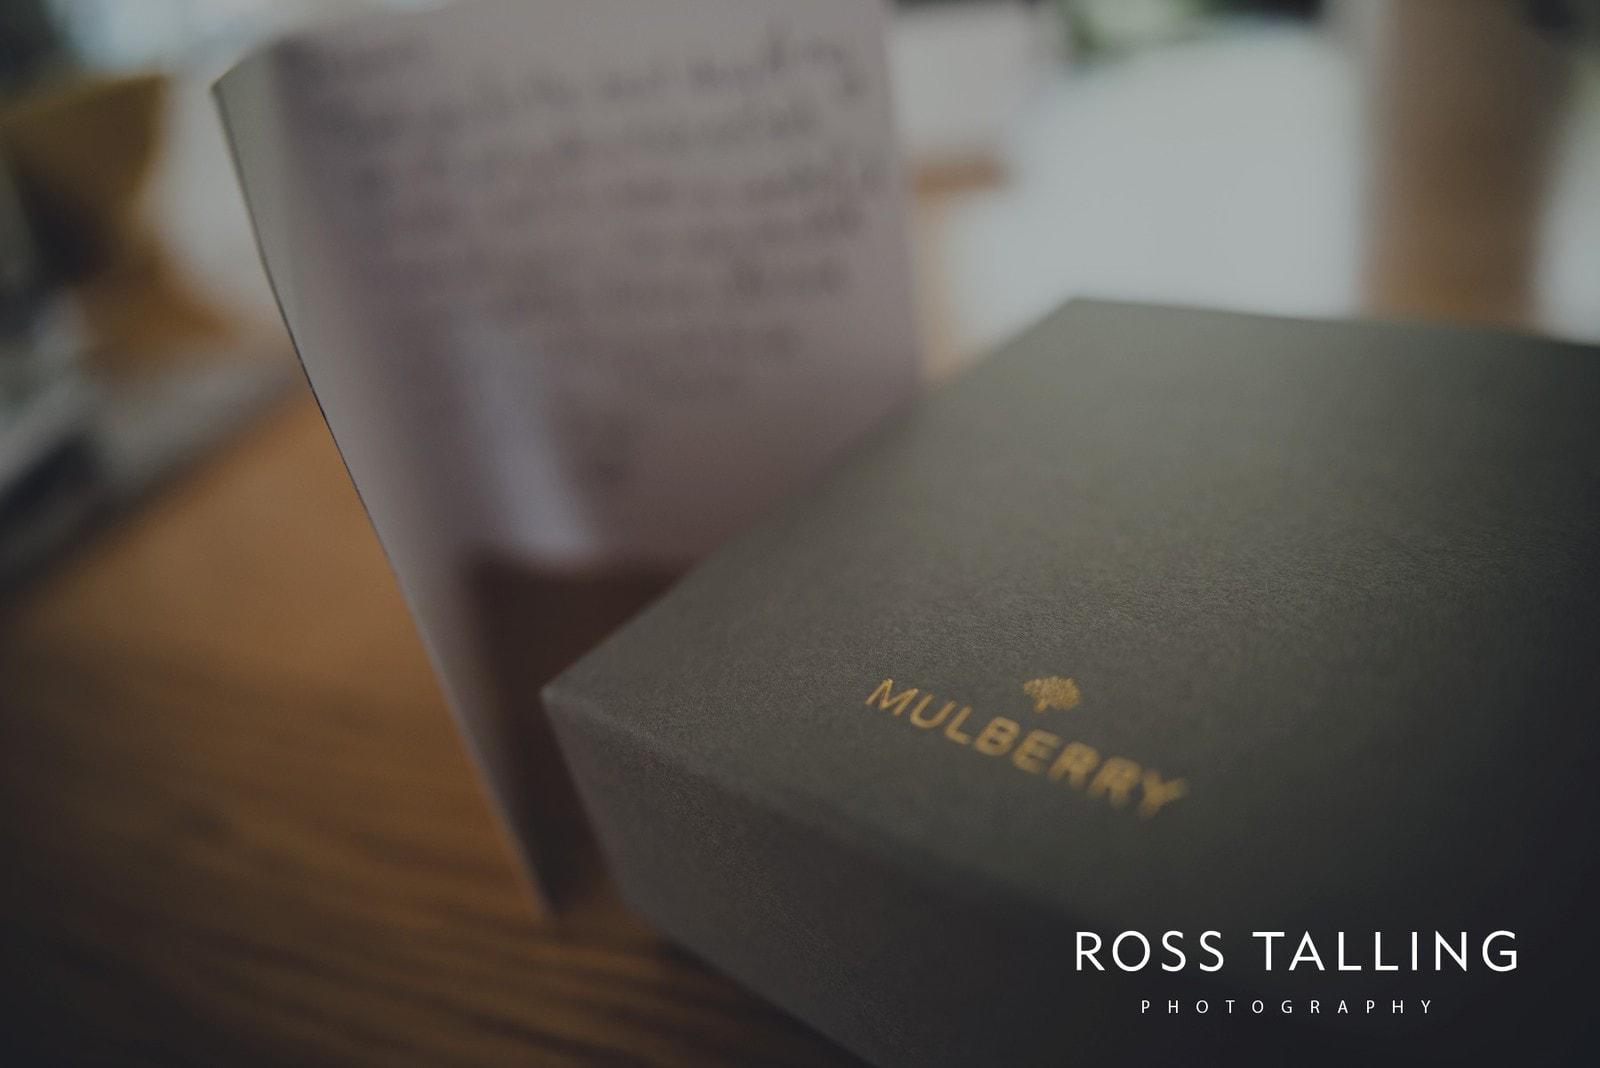 laura-matts-rosevine-hotel-wedding-photography-cornwall_0013